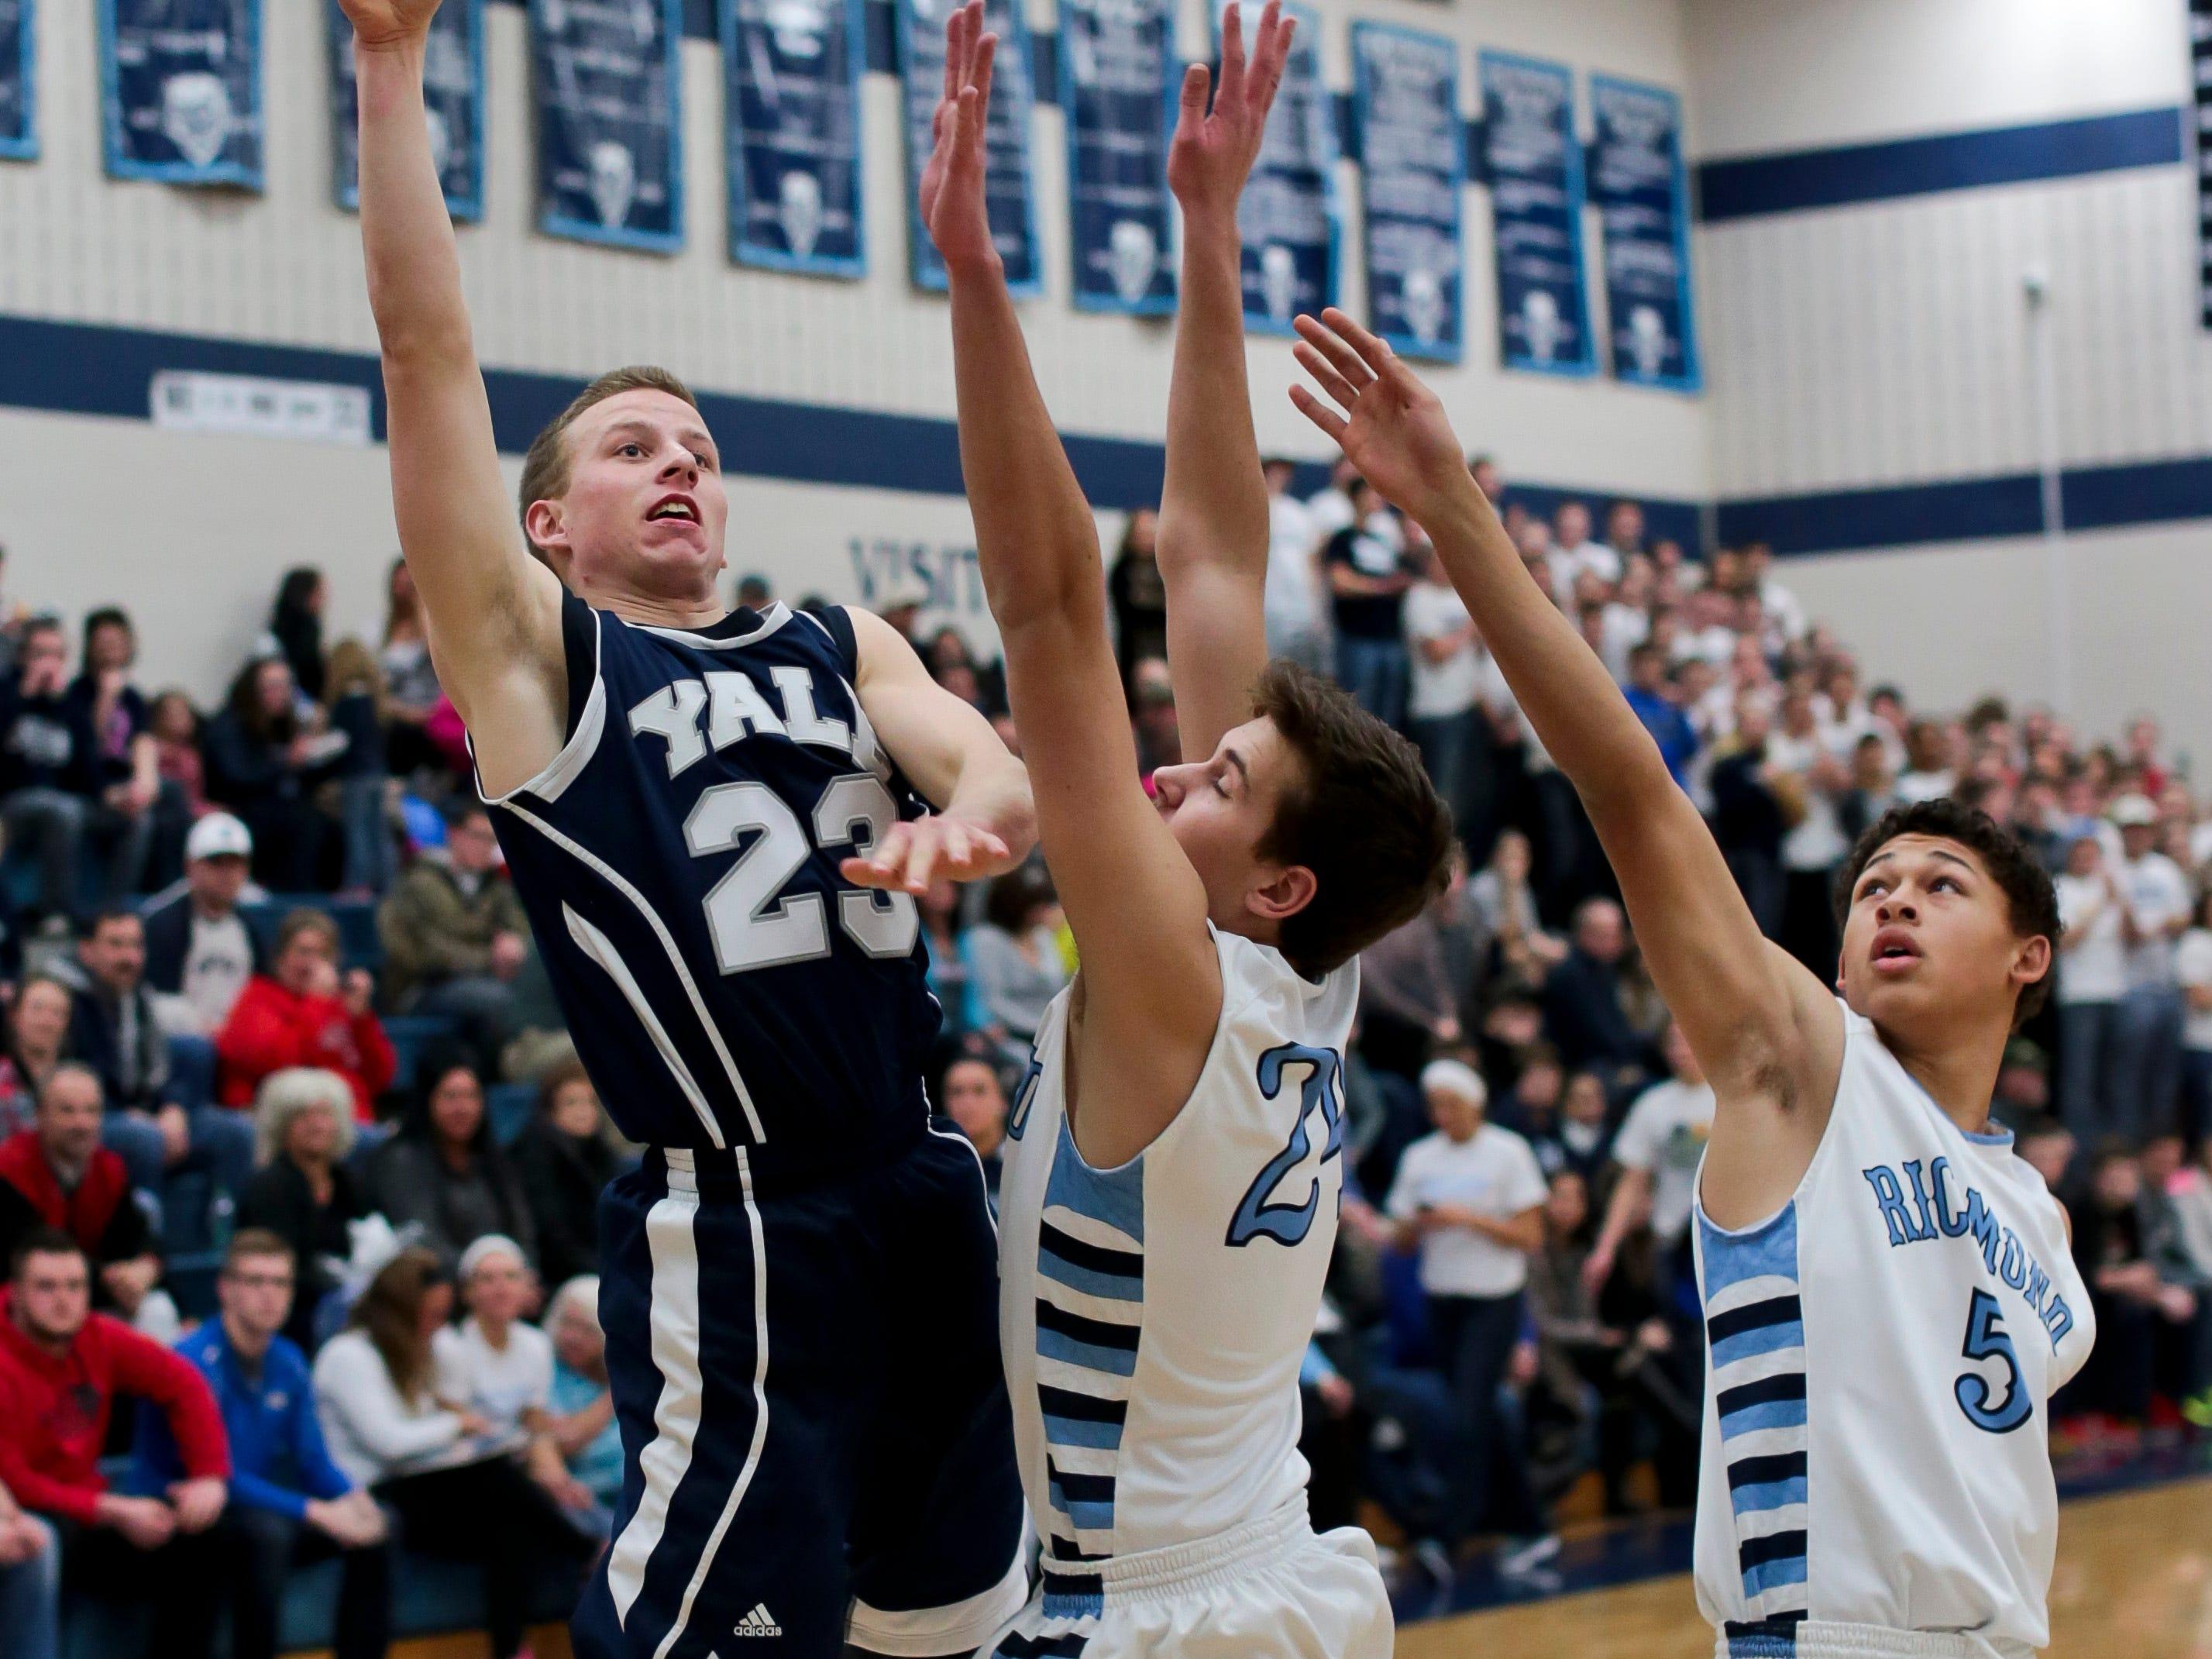 Yale senior Josh McClelland takes a shot over Richmond senior Evan Kratt and sophomore D'Sean Hamilton during a basketball game Friday, Feb. 27, 2015 at Richmond High School.